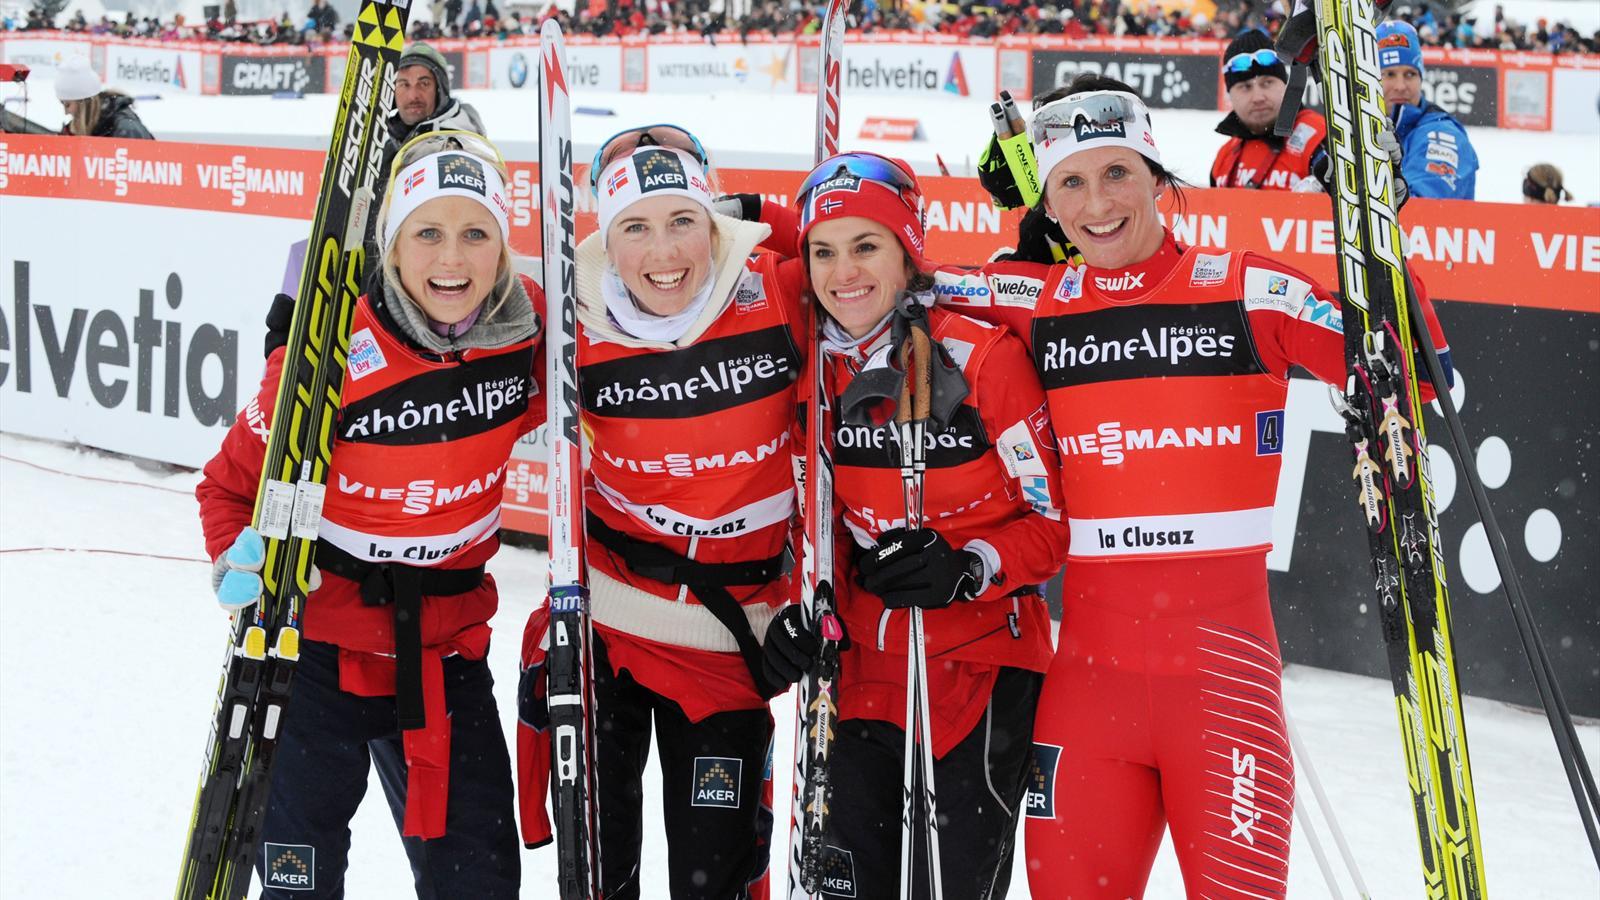 Norway's women ensure clean sweep in La Clusaz - Cross-Country Skiing - Eurosport